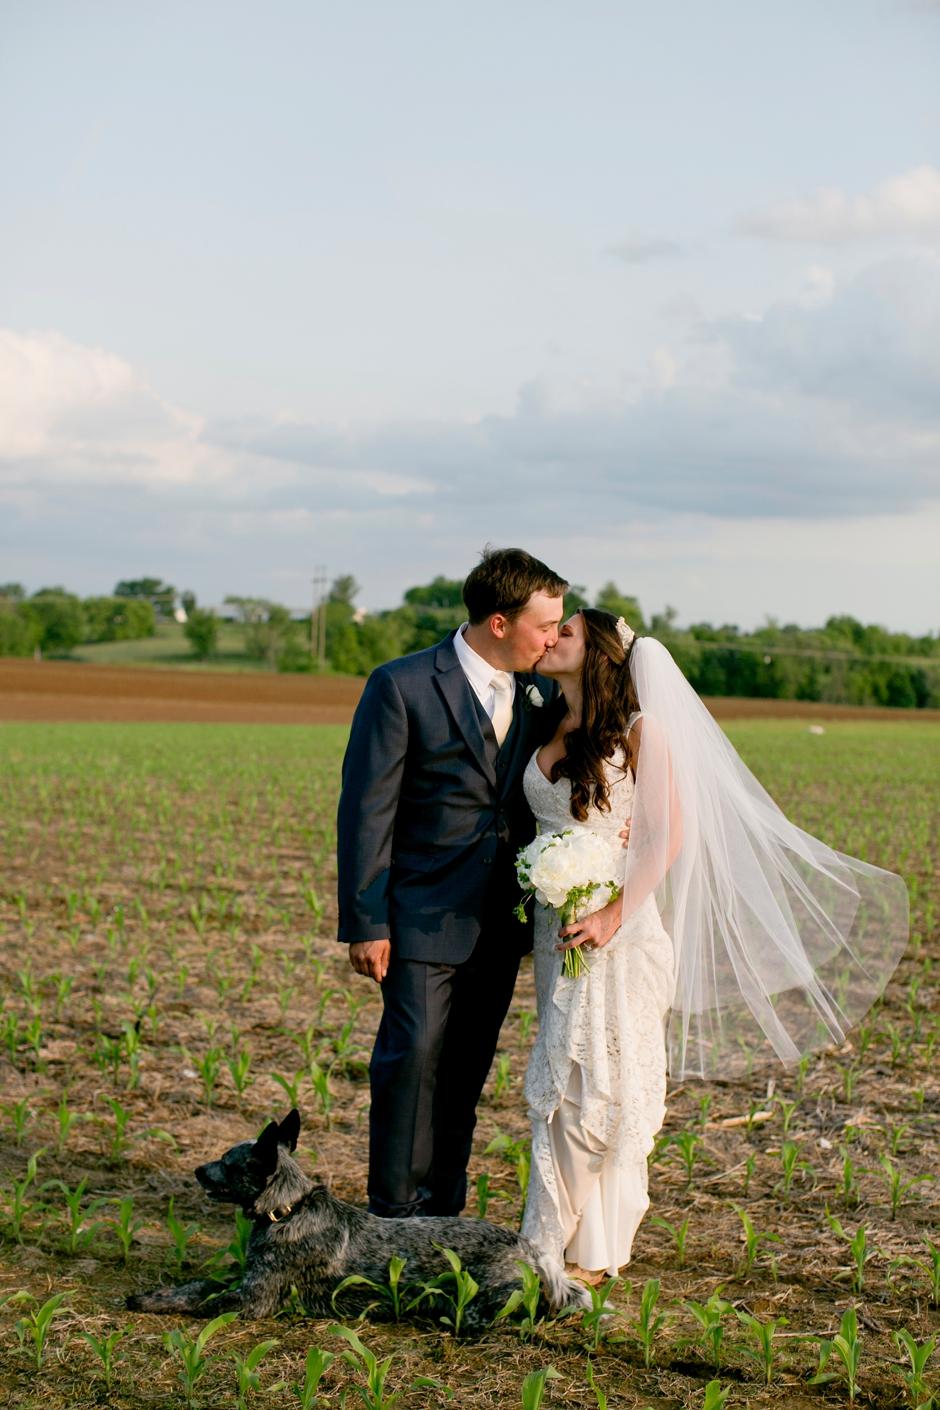 langley-farm-bourbon-wedding-spring-cream-bride-woodford-751